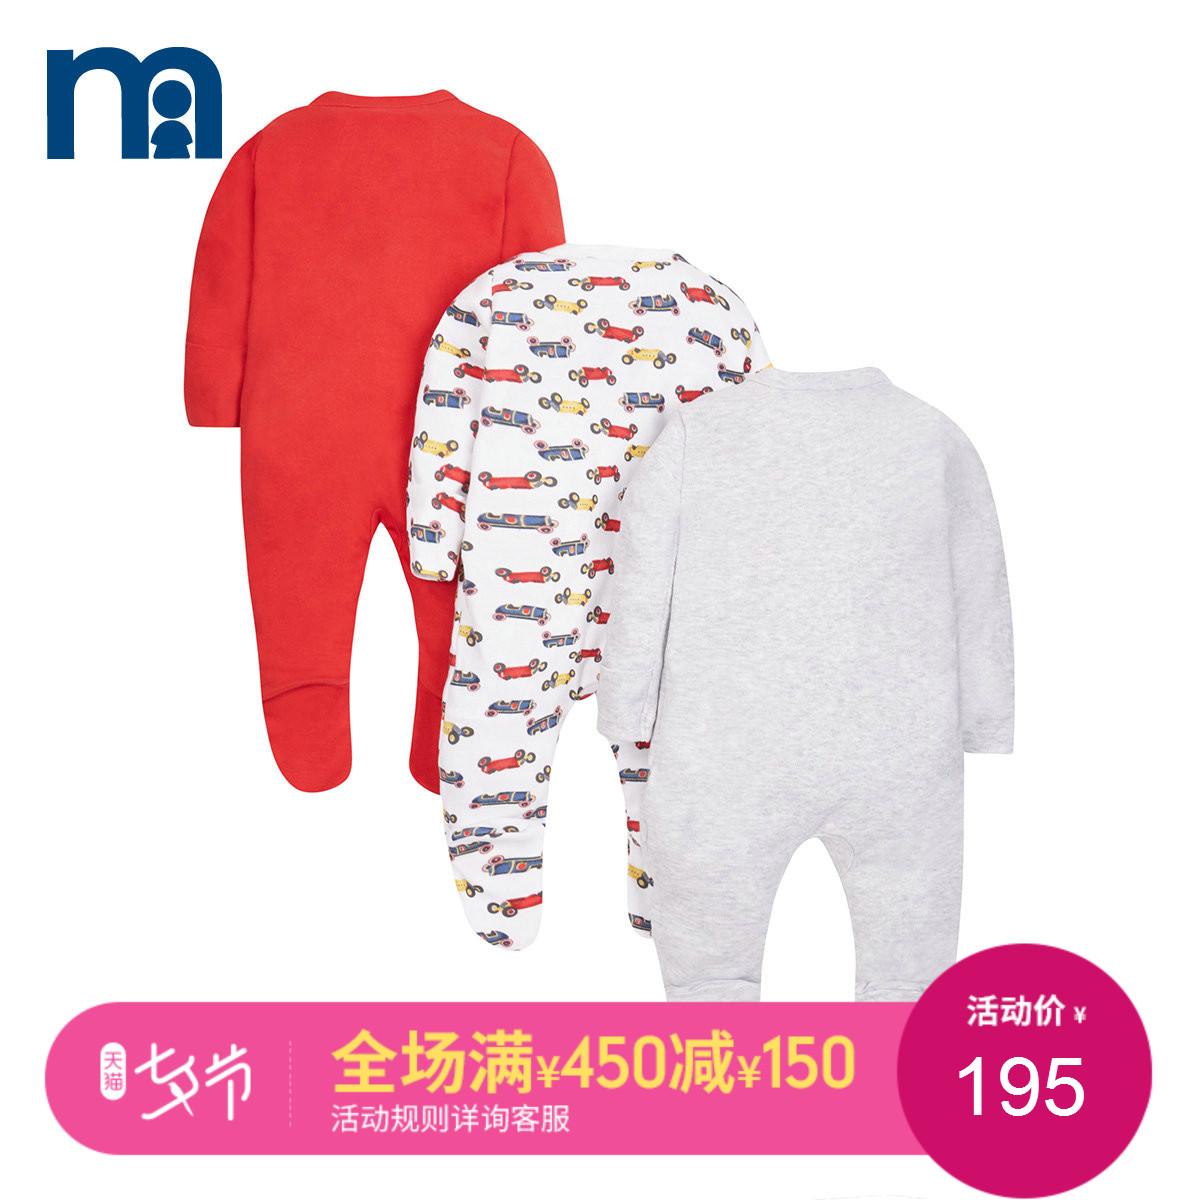 mothercare新生儿连体衣3件男婴长袖爬服婴儿包脚衣新生儿衣服